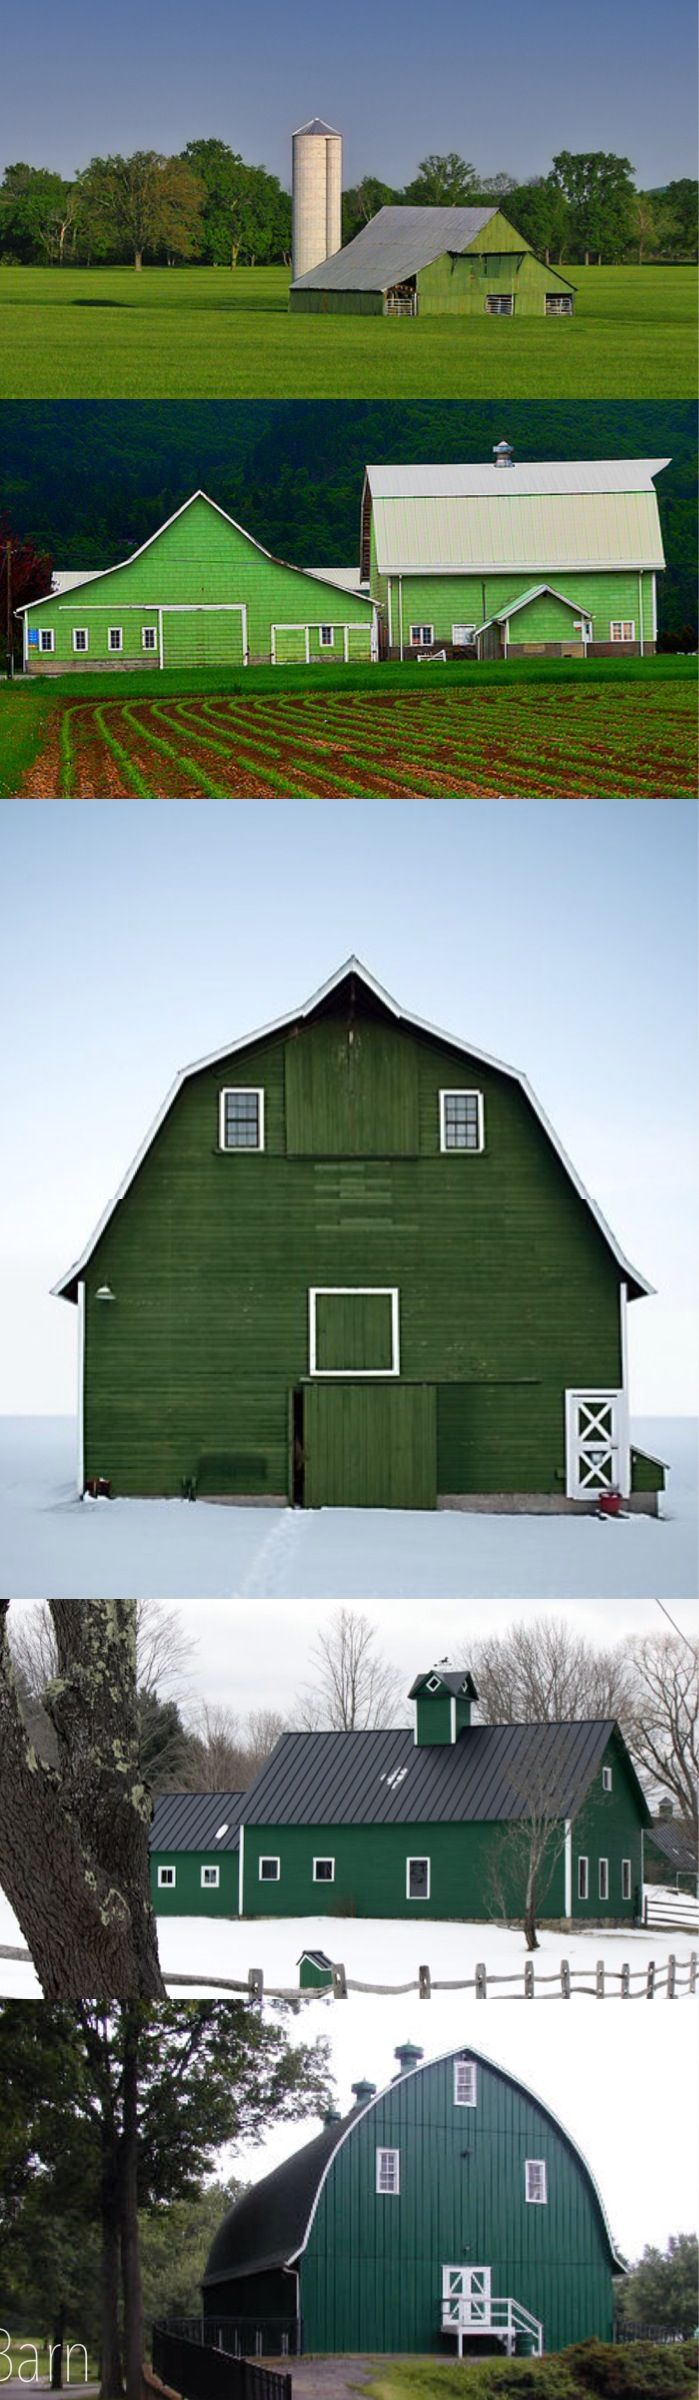 Barns O' green... I DO love green barns.  I did not say green beans.